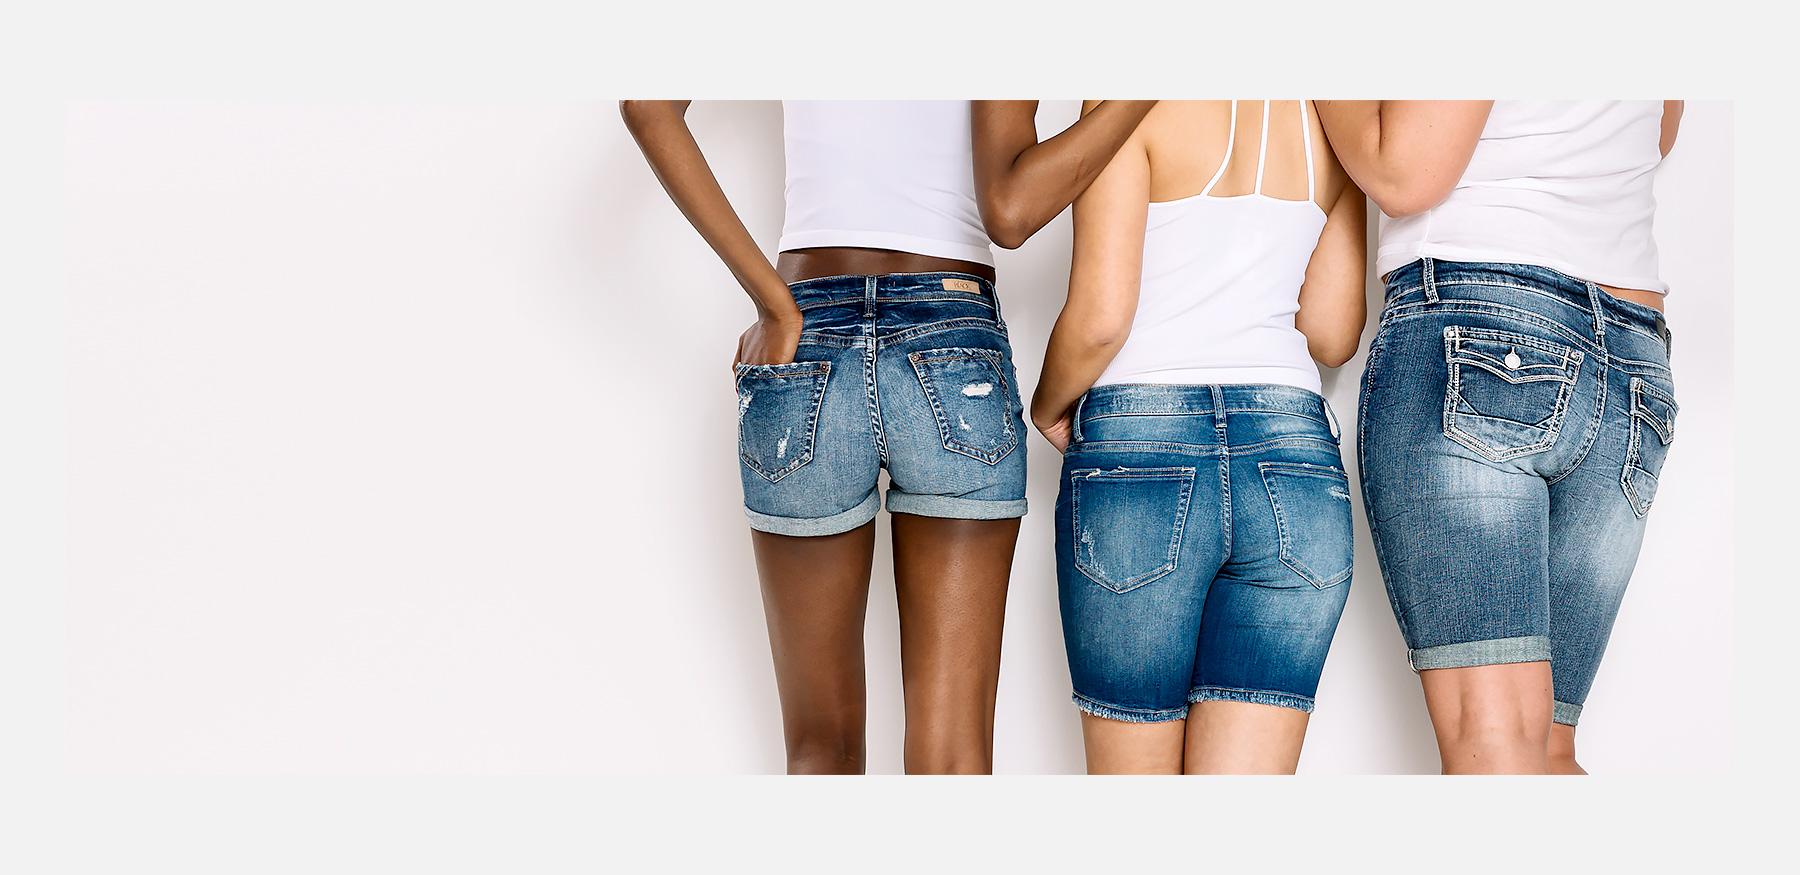 Three girls wearing white tanks and tees and denim shorts